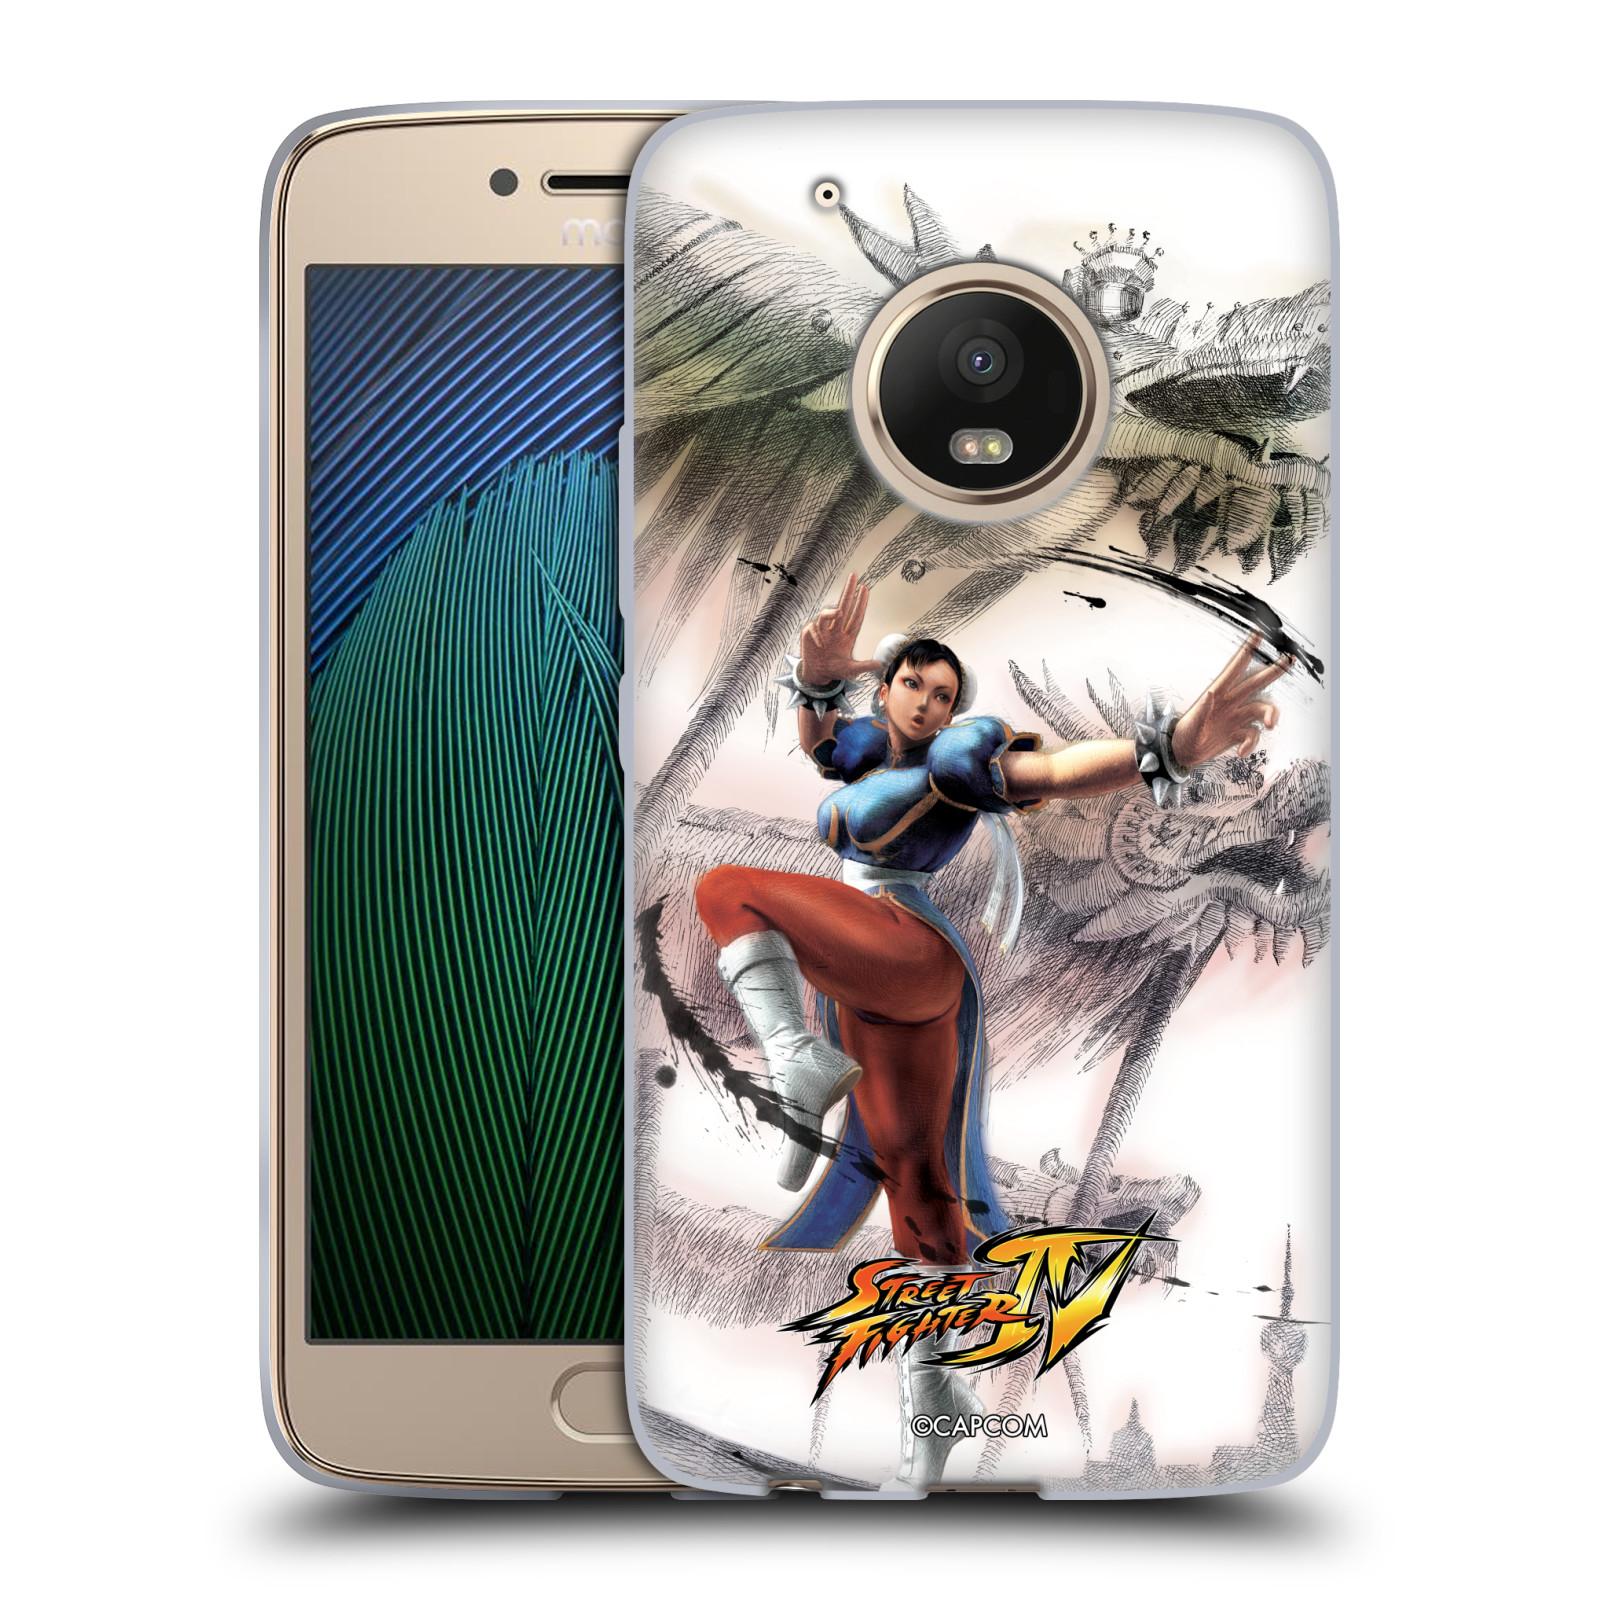 HEAD CASE silikonový obal na mobil Lenovo Moto G5 PLUS oficiální kryt STREET FIGHTER bojovnice Chun-Li kresba